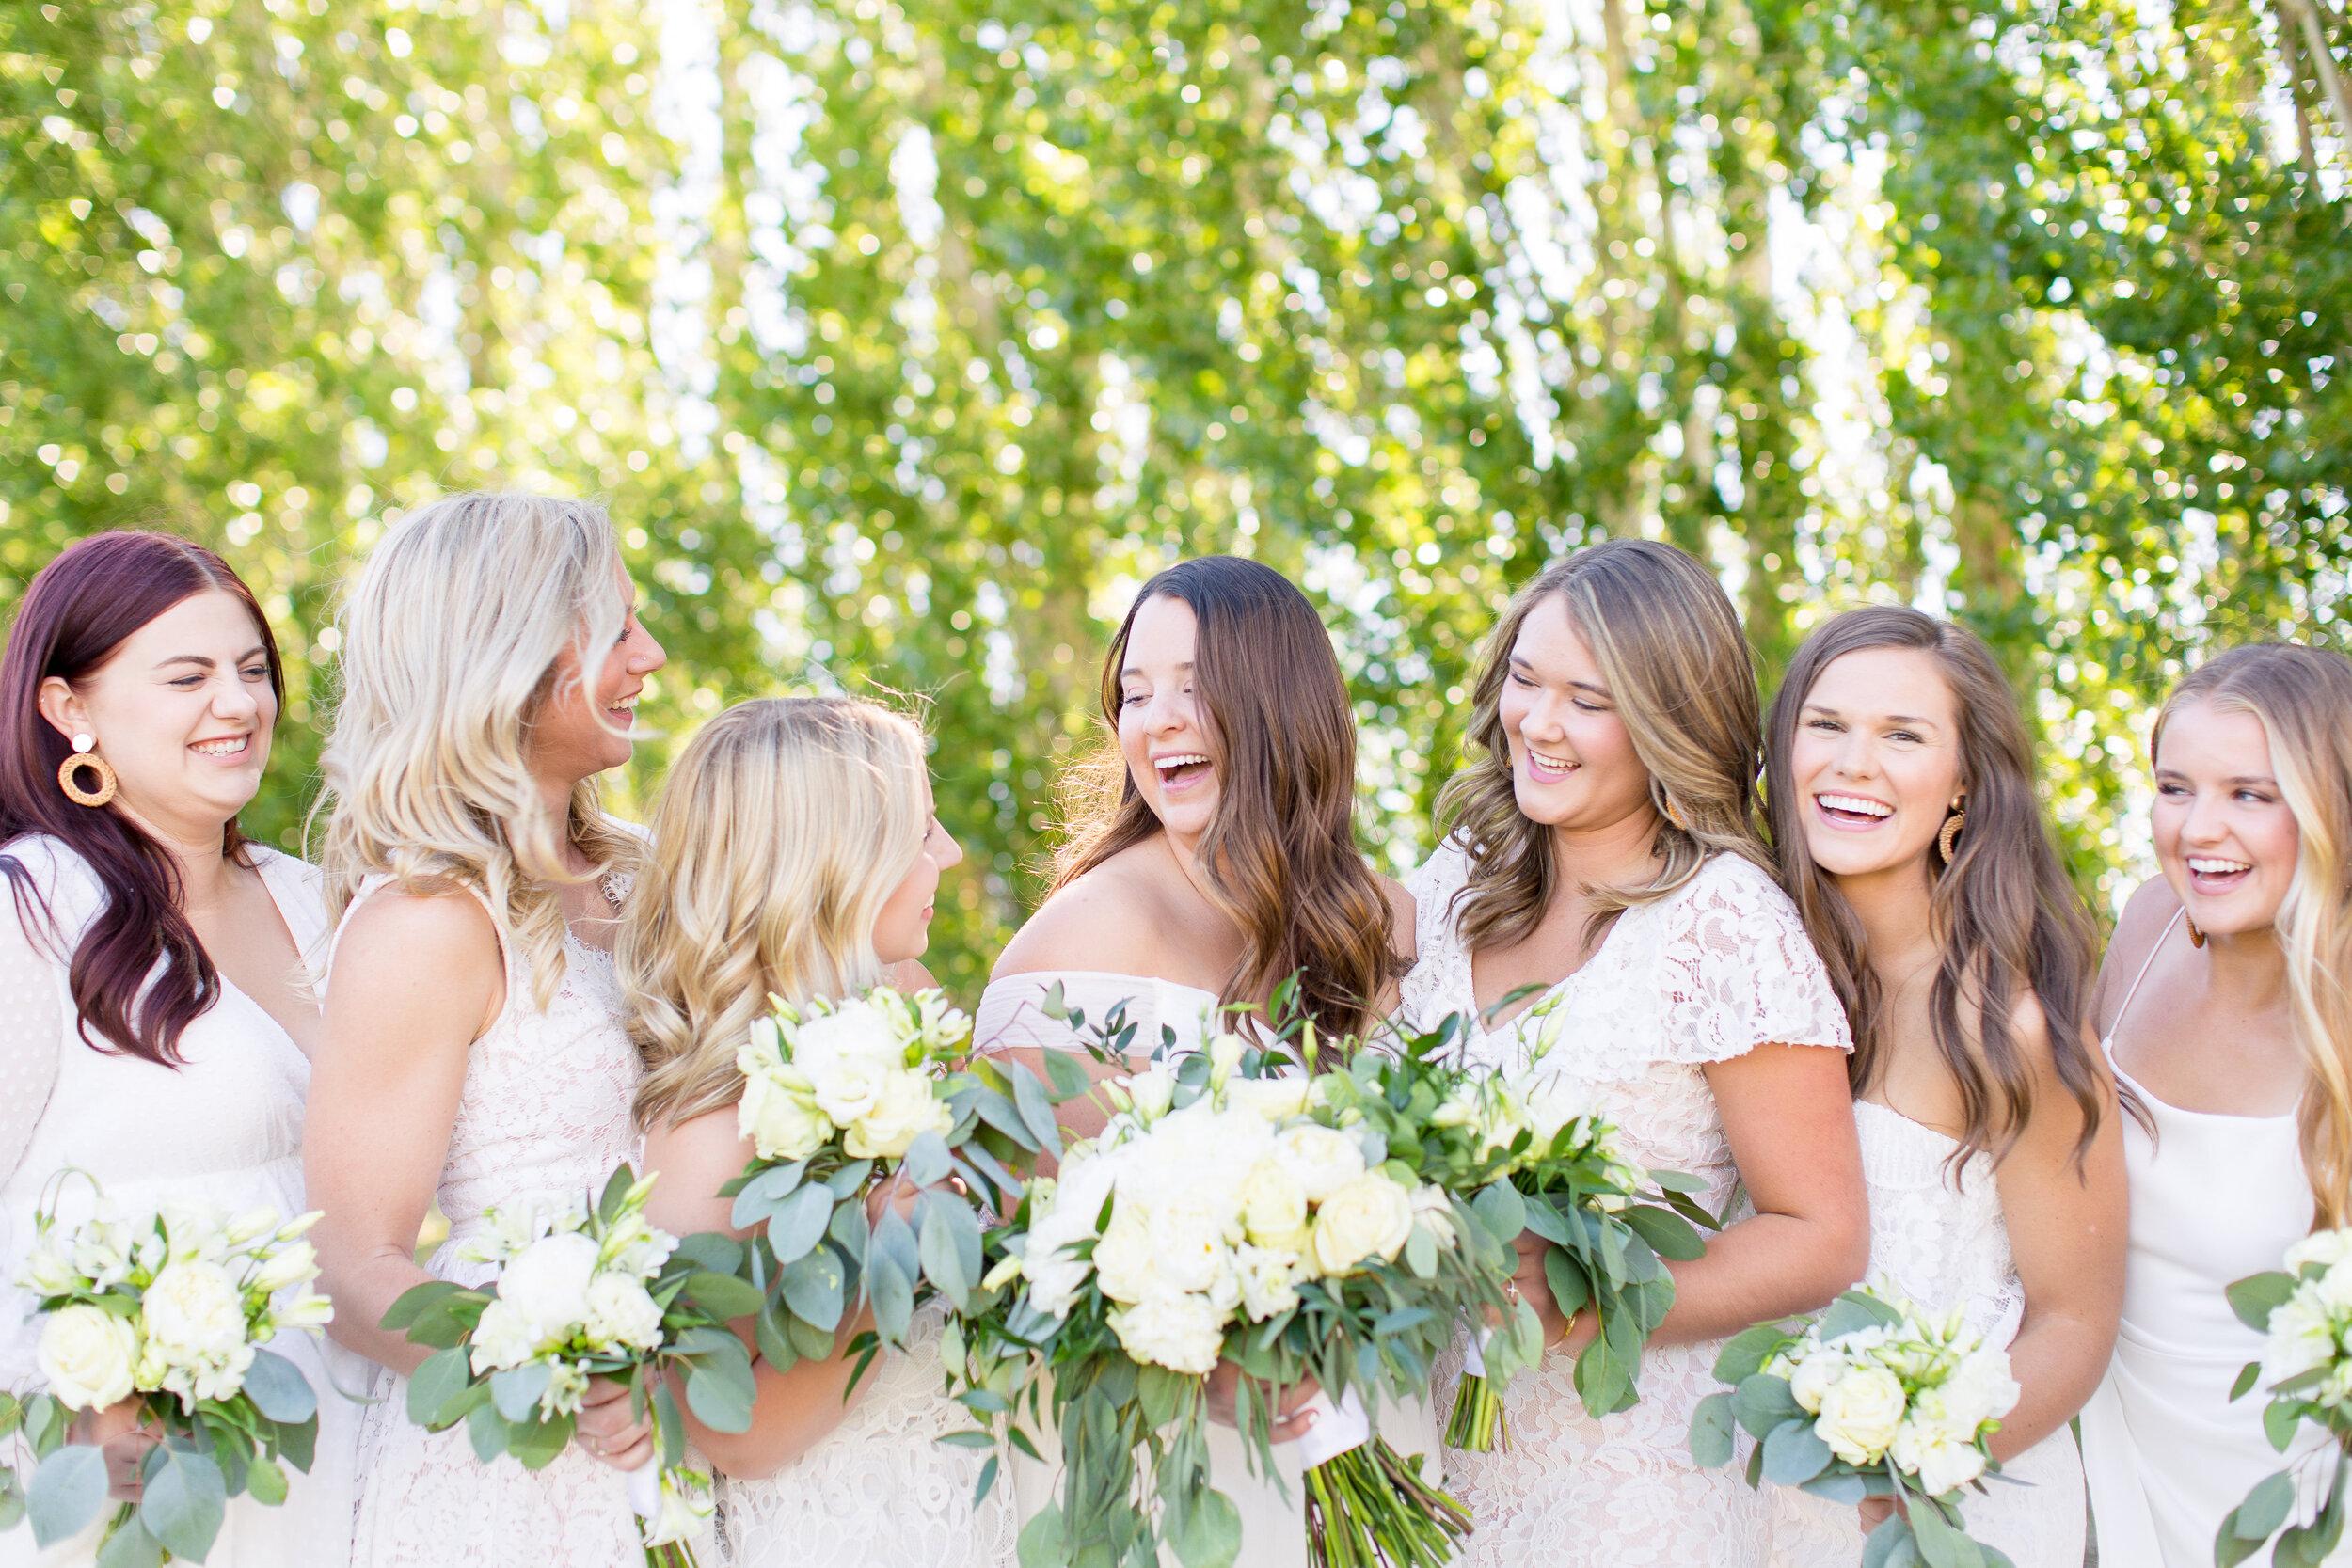 spokane bridesmaids wedding